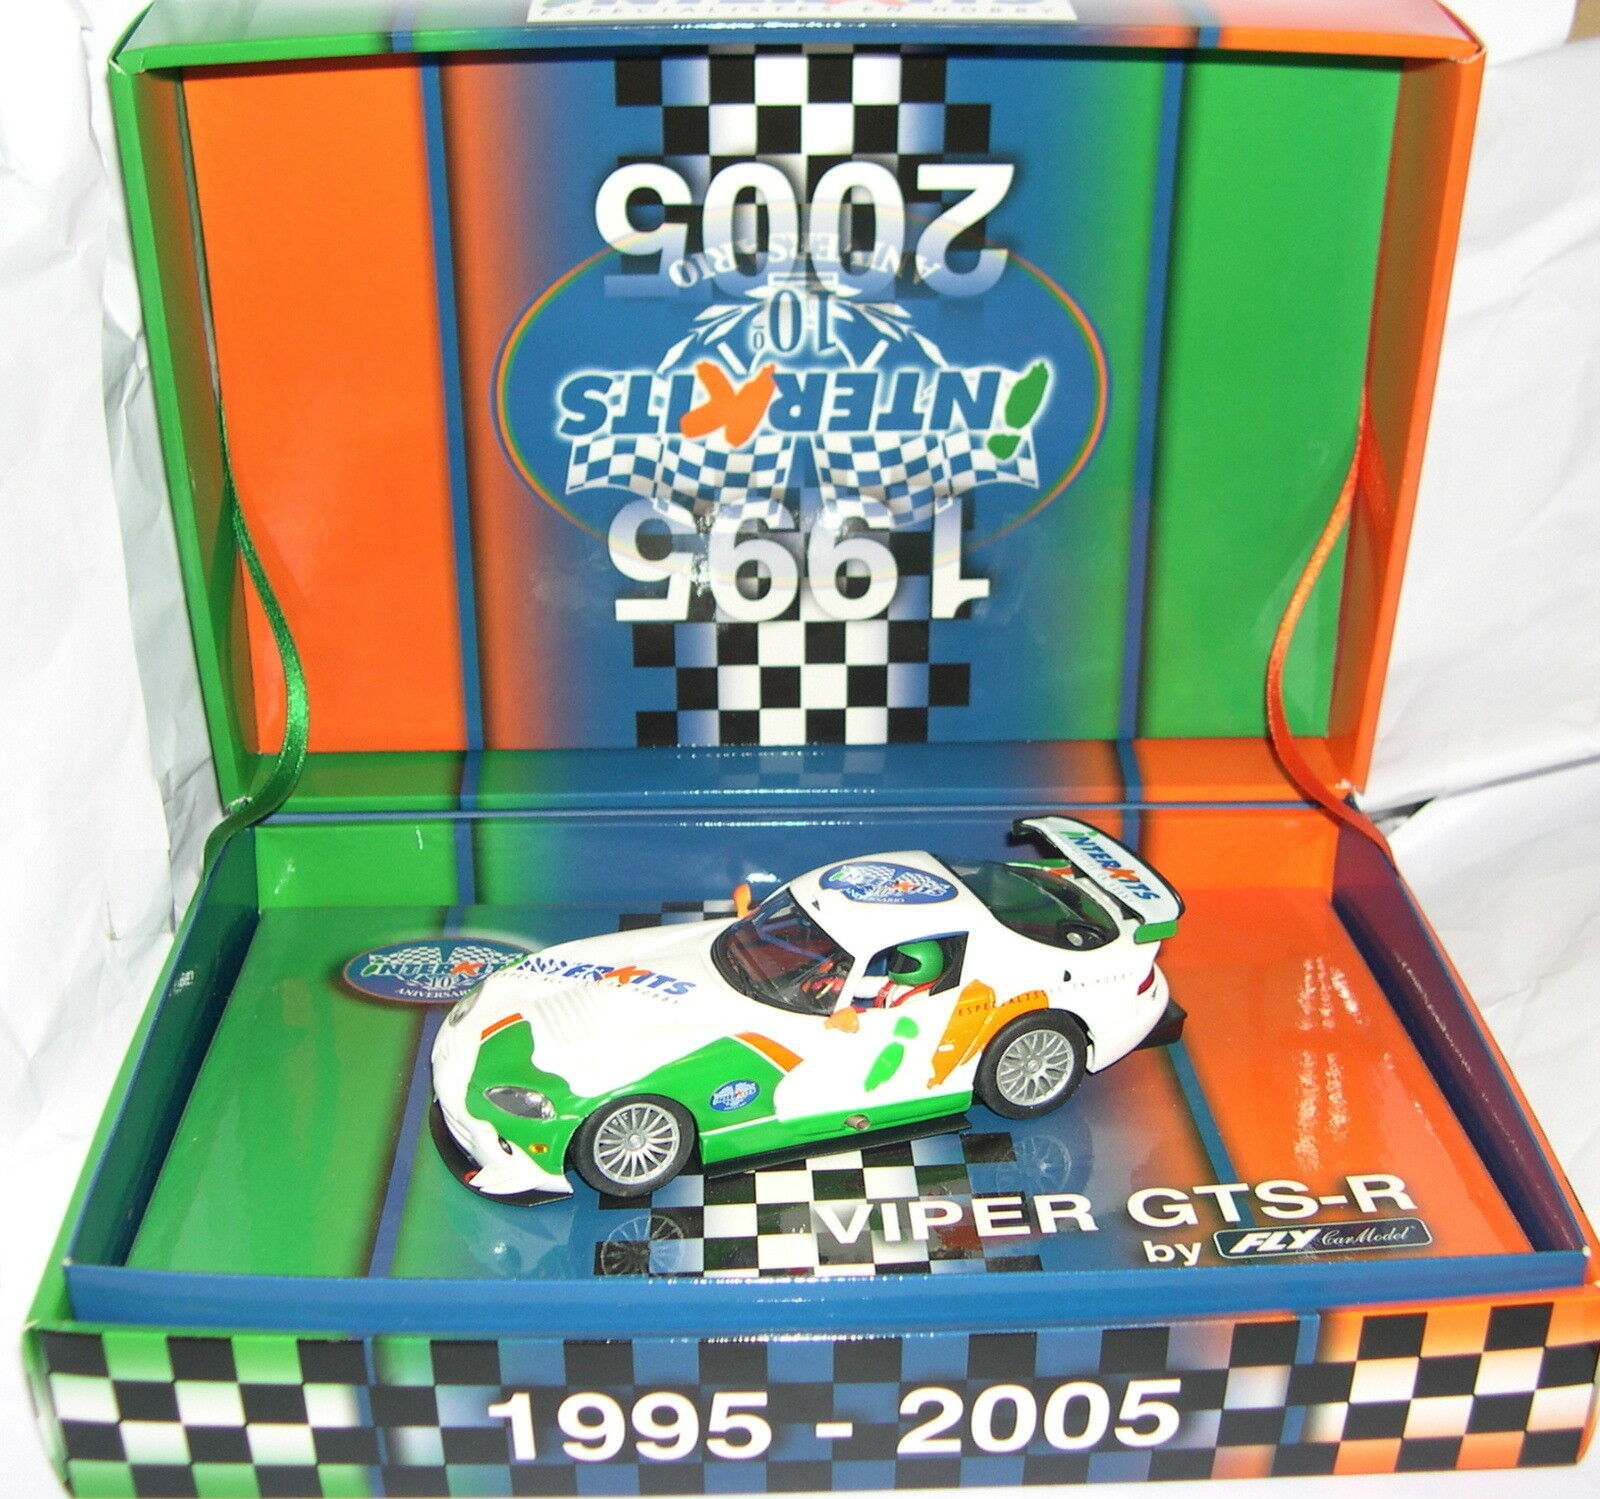 FLY 96053 E-83 SLOT CAR DODGE VIPER VIPER VIPER GTS-R 10GRAD JUBILÄUM INTERK LTED.ED. MB fd4faa